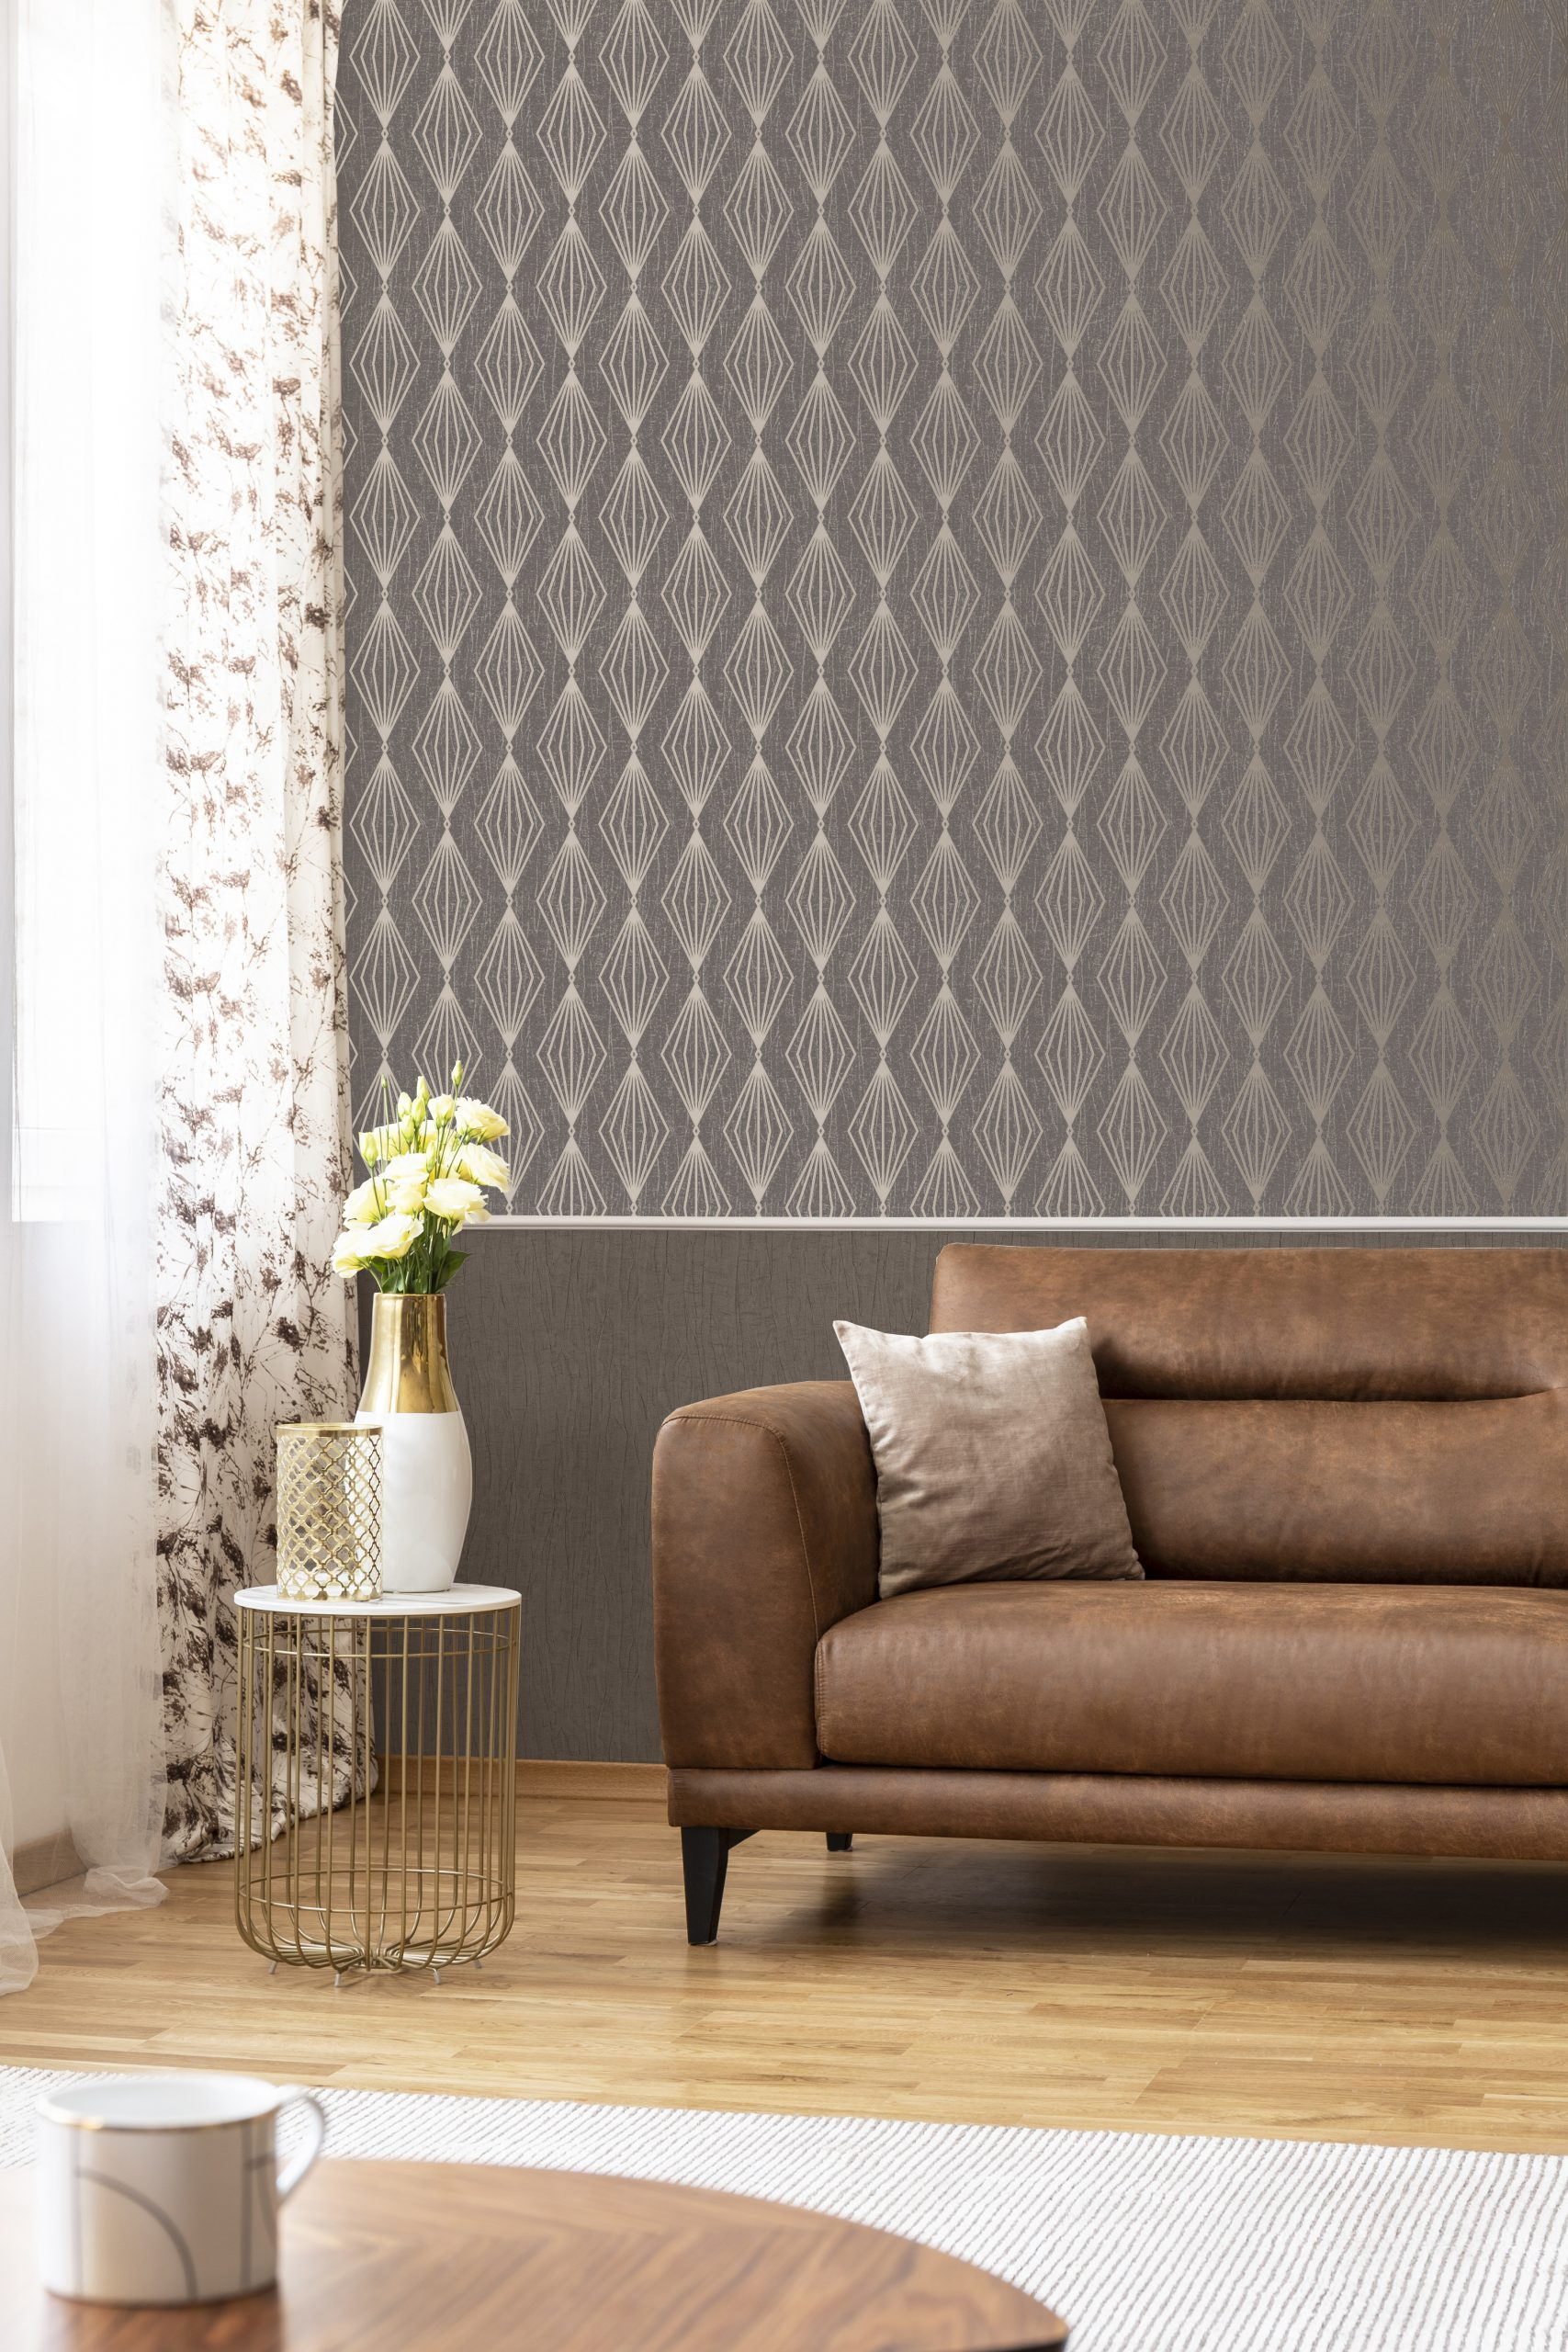 Marquise Geometric Copper 111311 Wallpaper Sales